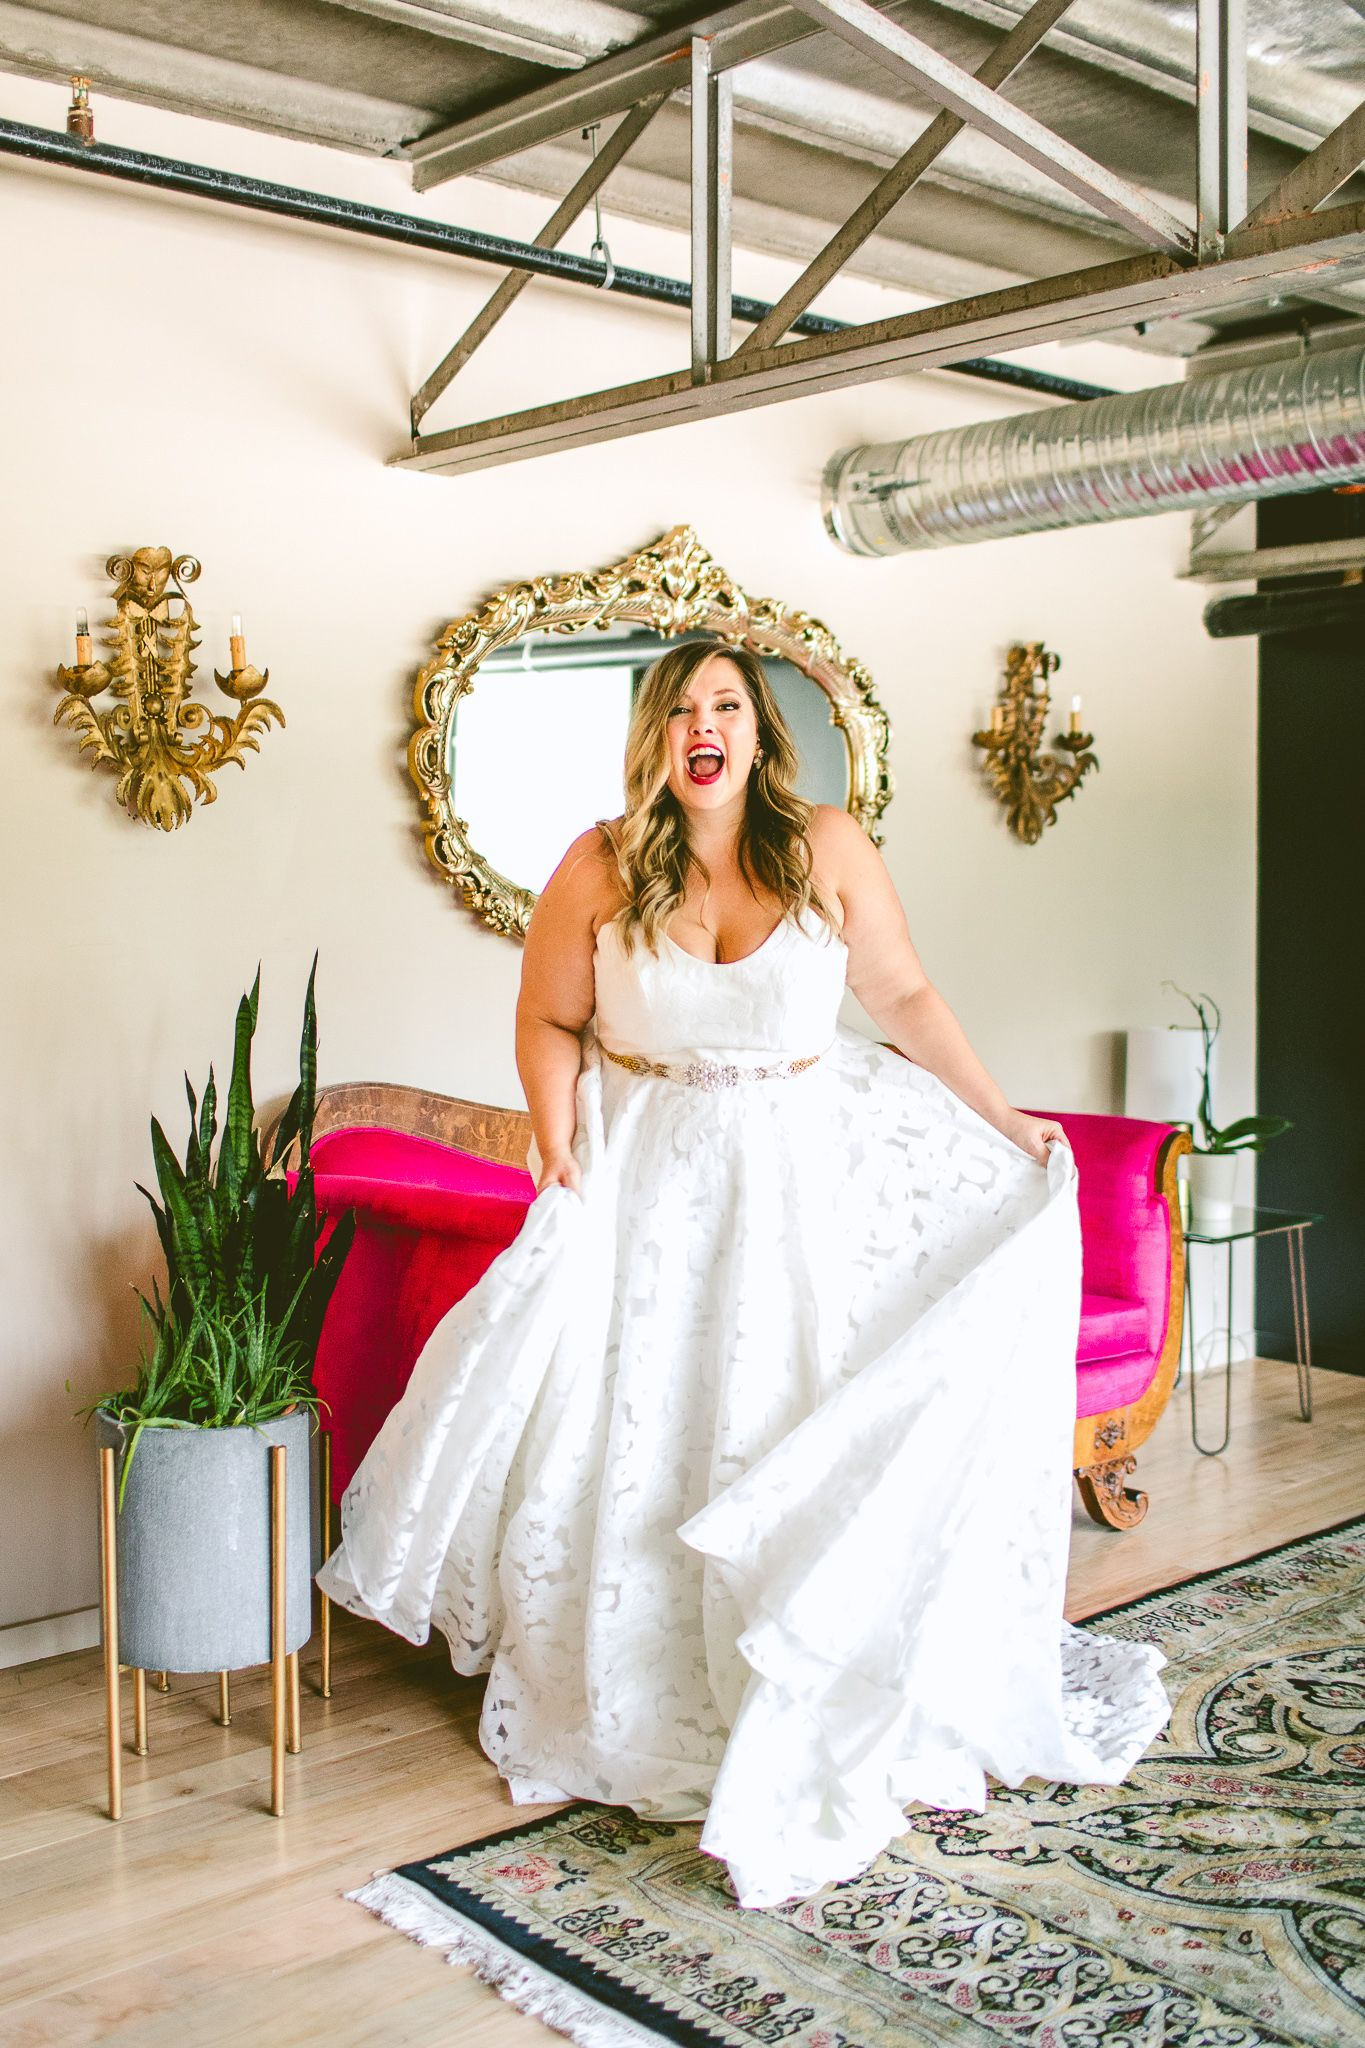 Gilded Curves Annie By Truvelle Wedding Dresses Bridal Designs Designer Wedding Dresses [ 2048 x 1365 Pixel ]